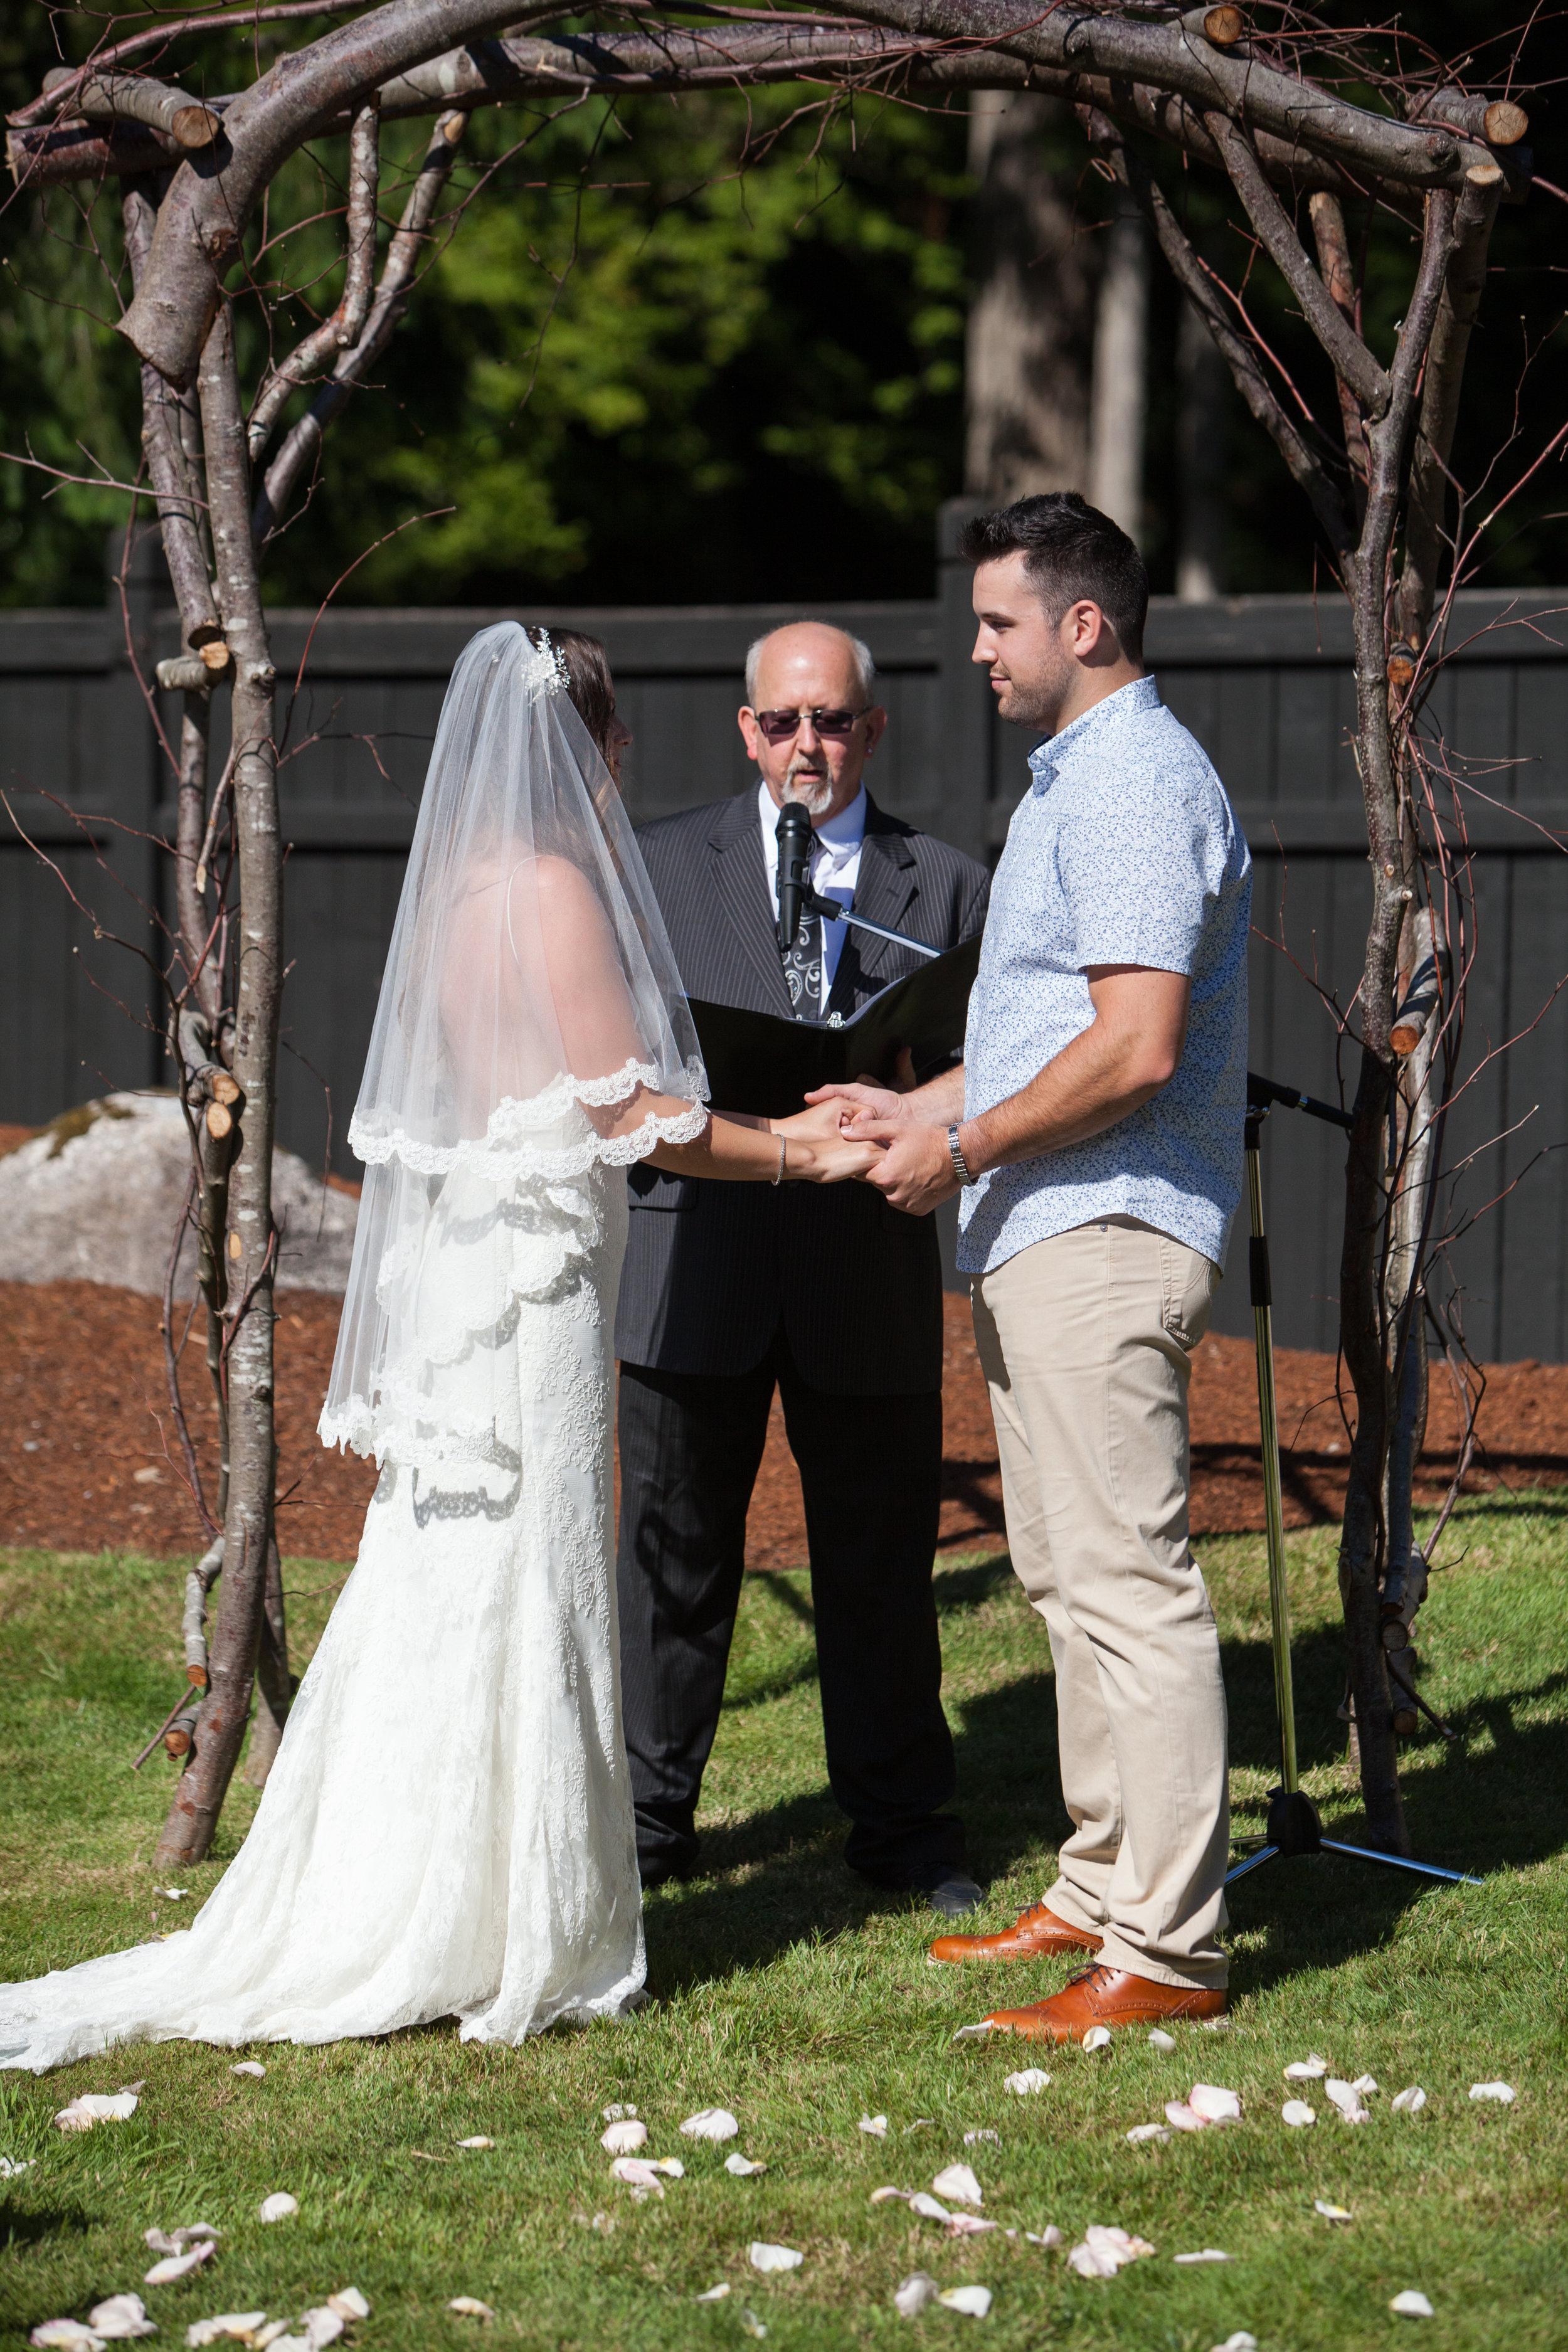 sandstrom_wedding_394.jpg